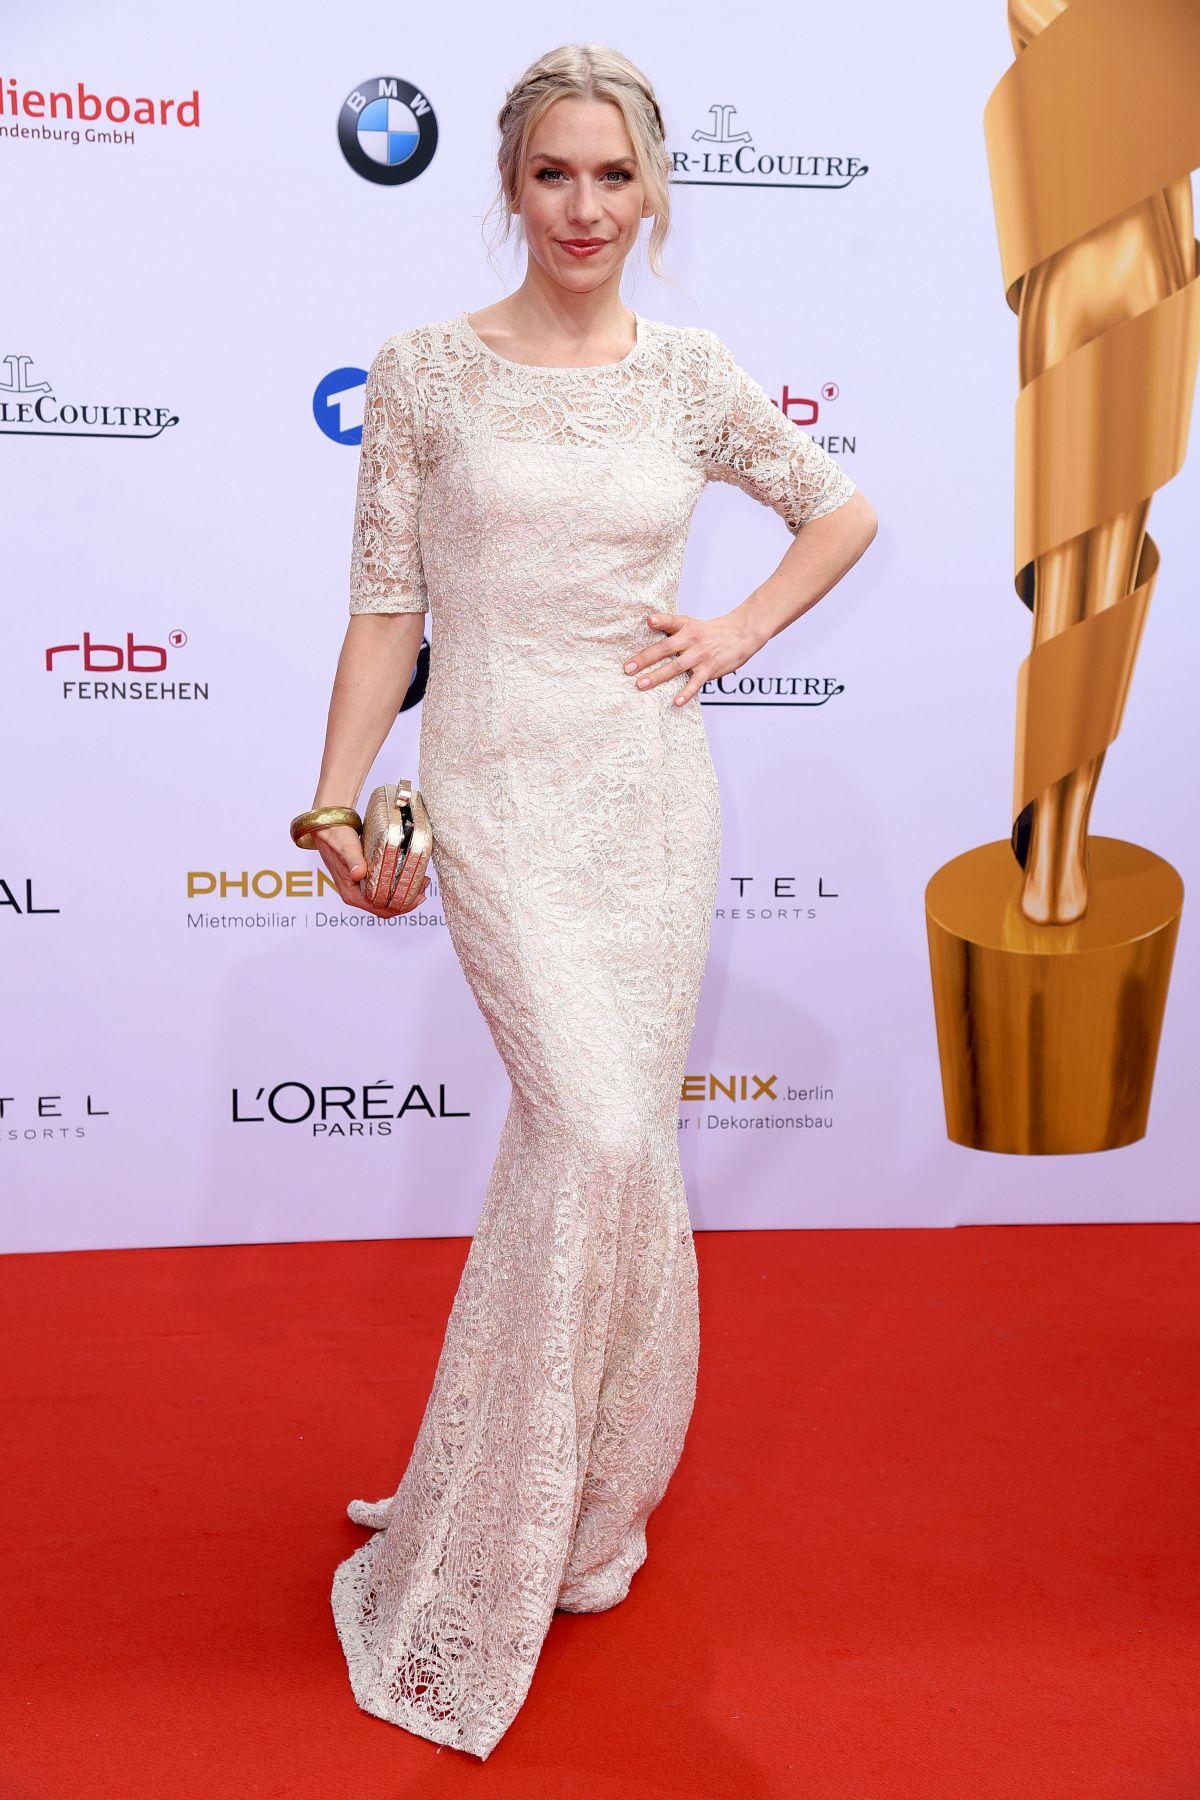 JULIA DIETZE at Lola German Film Awards in Berlin 05/27/2016